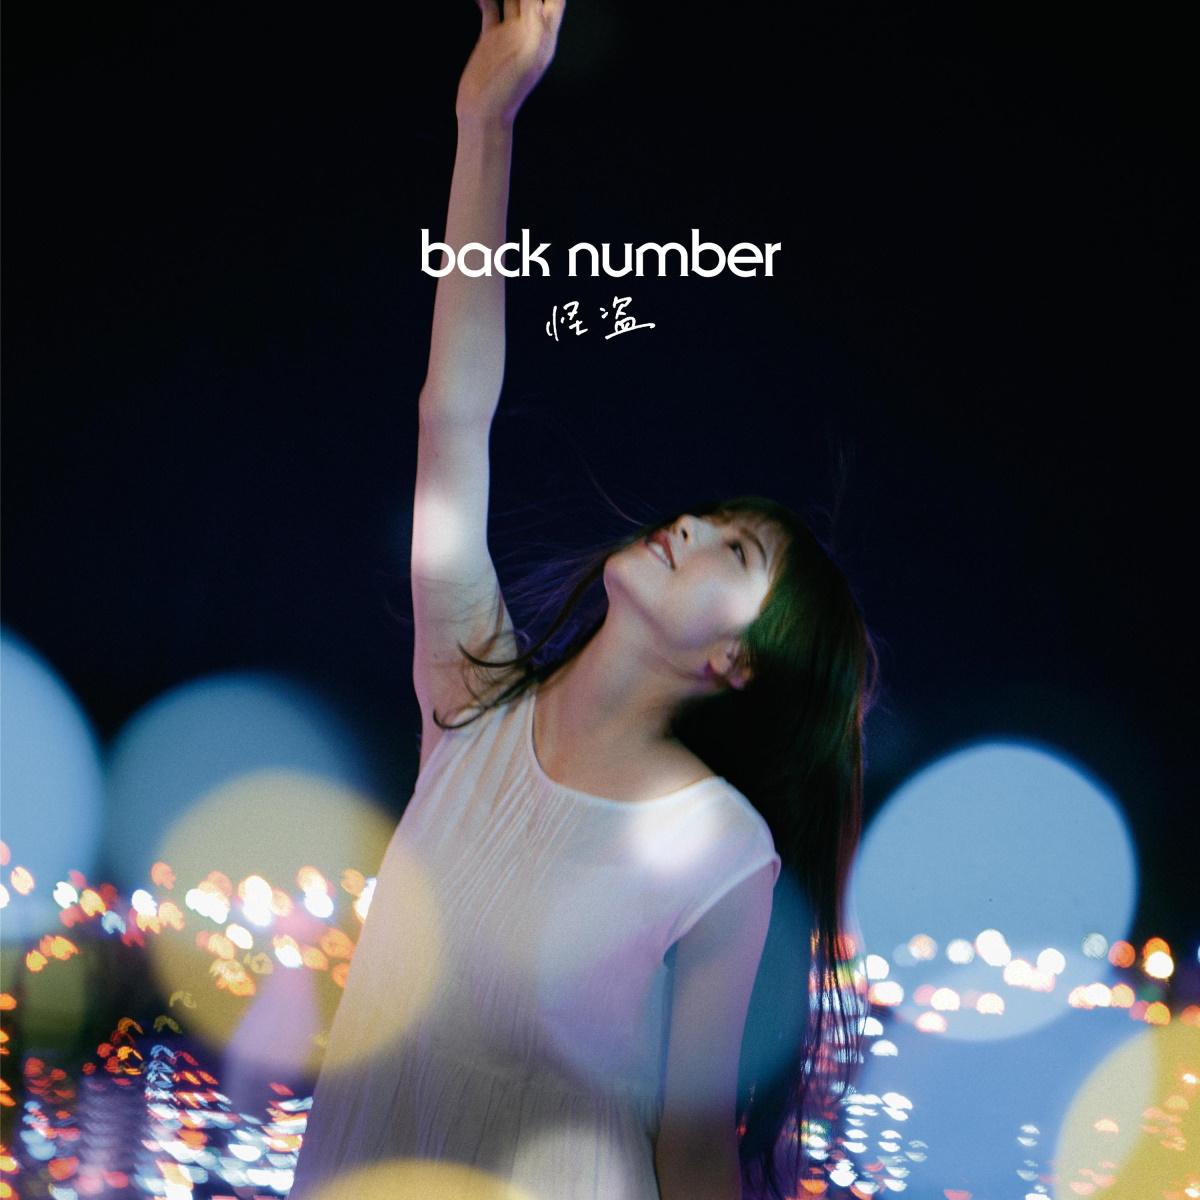 『back number - 怪盗』収録の『怪盗』ジャケット